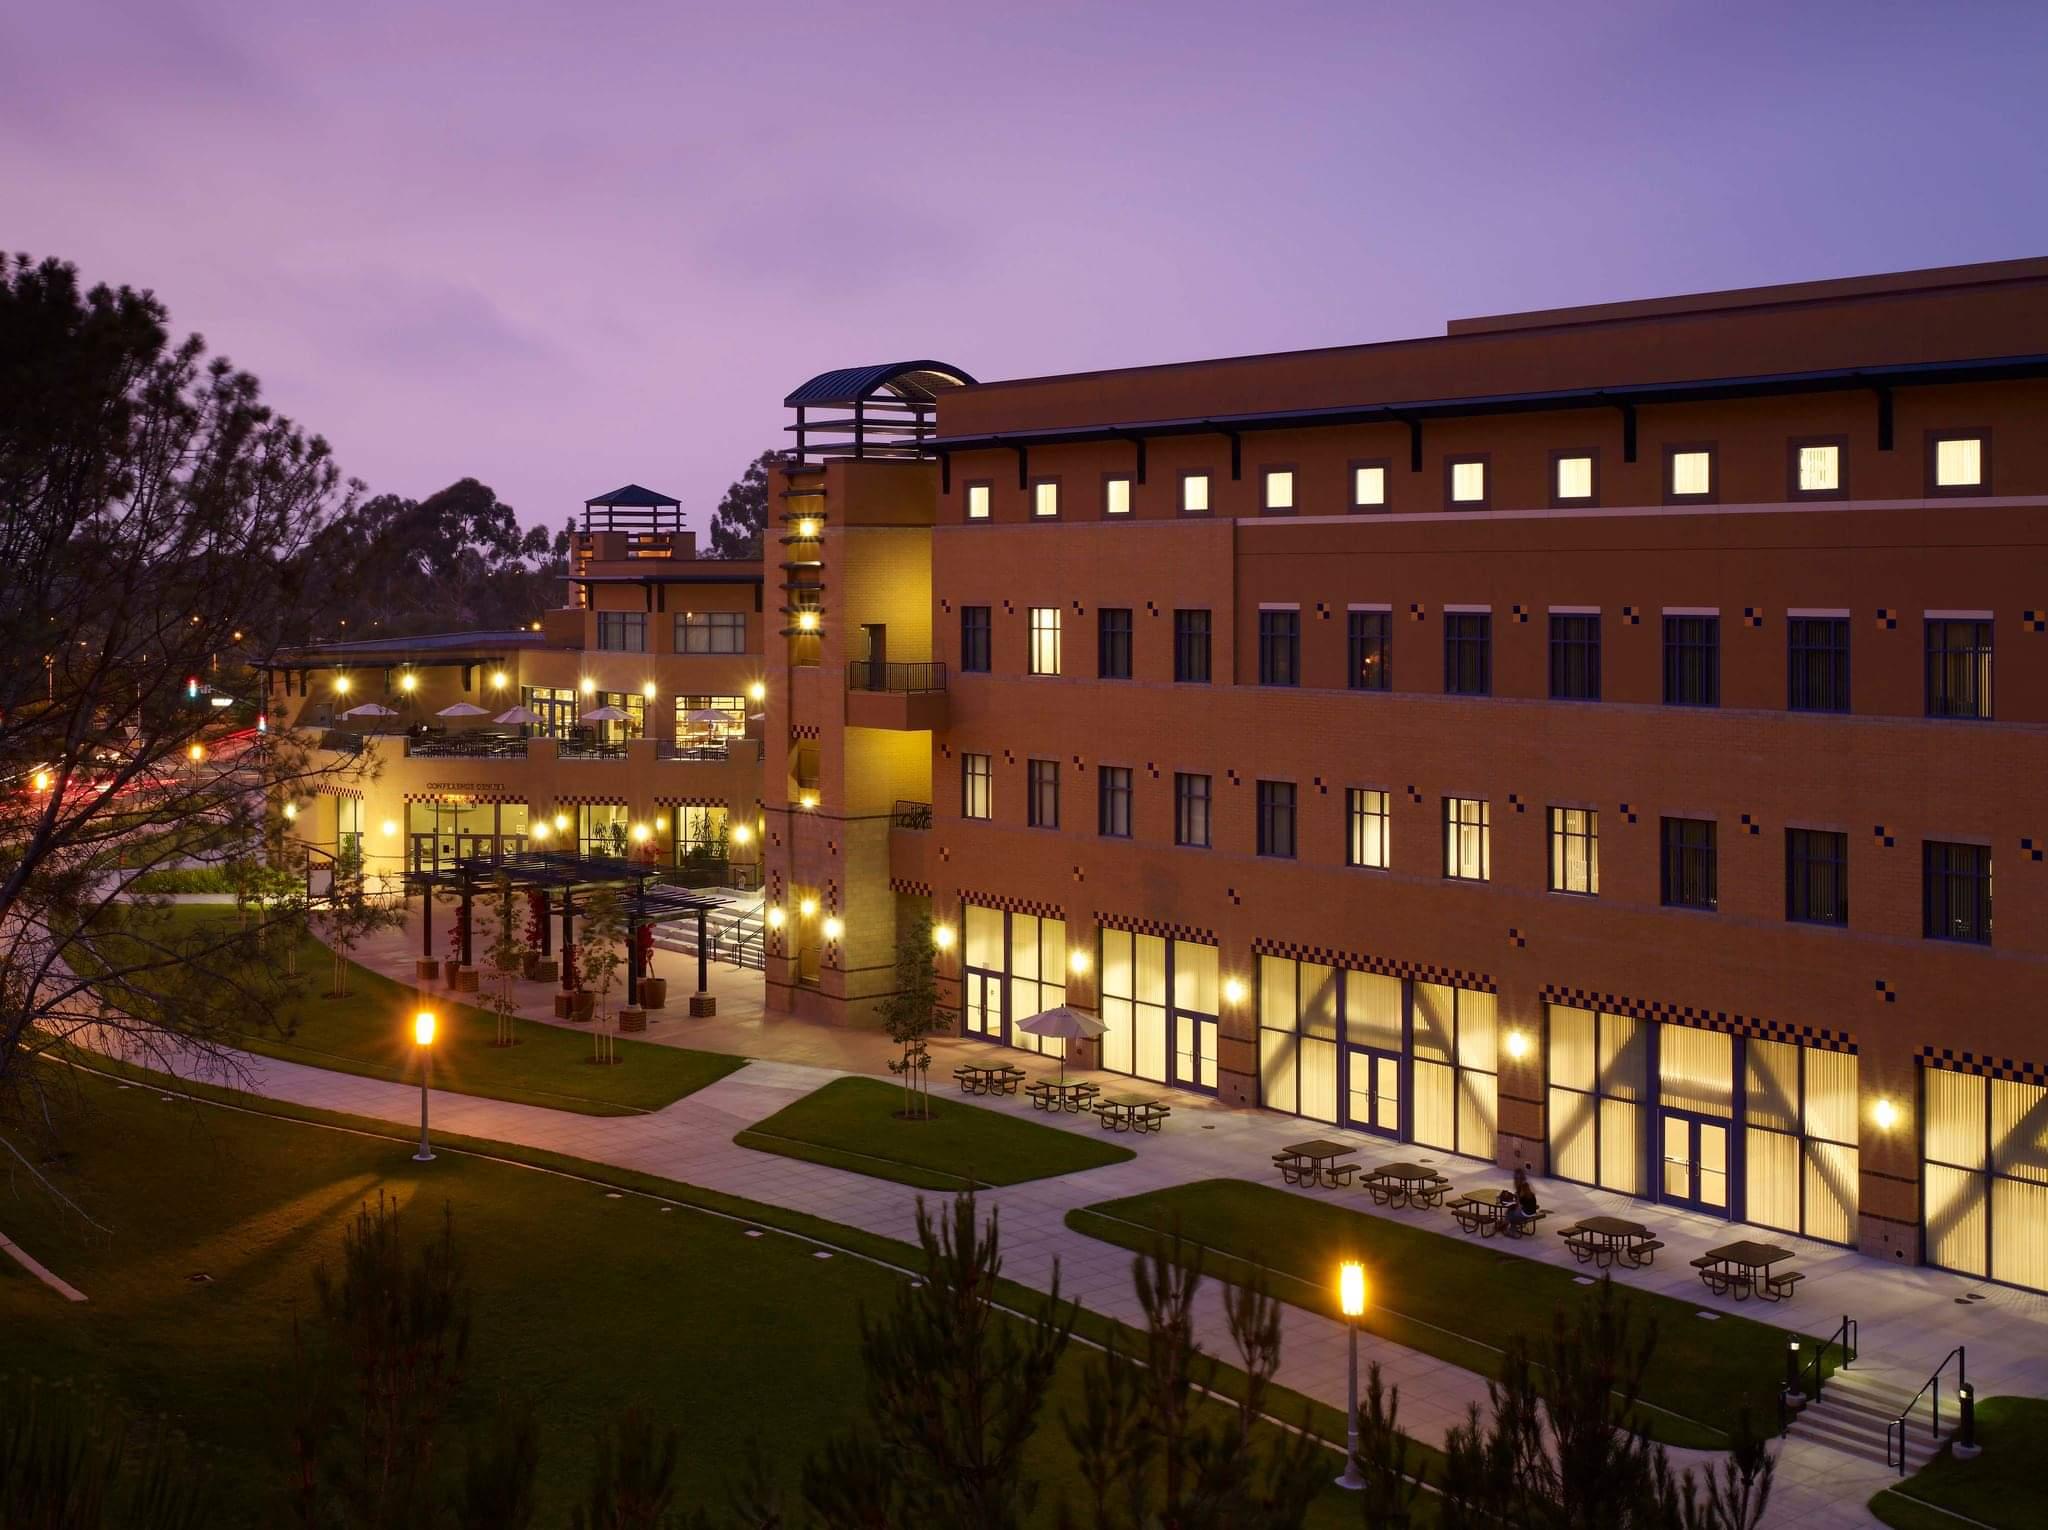 UC Irvine Student Center